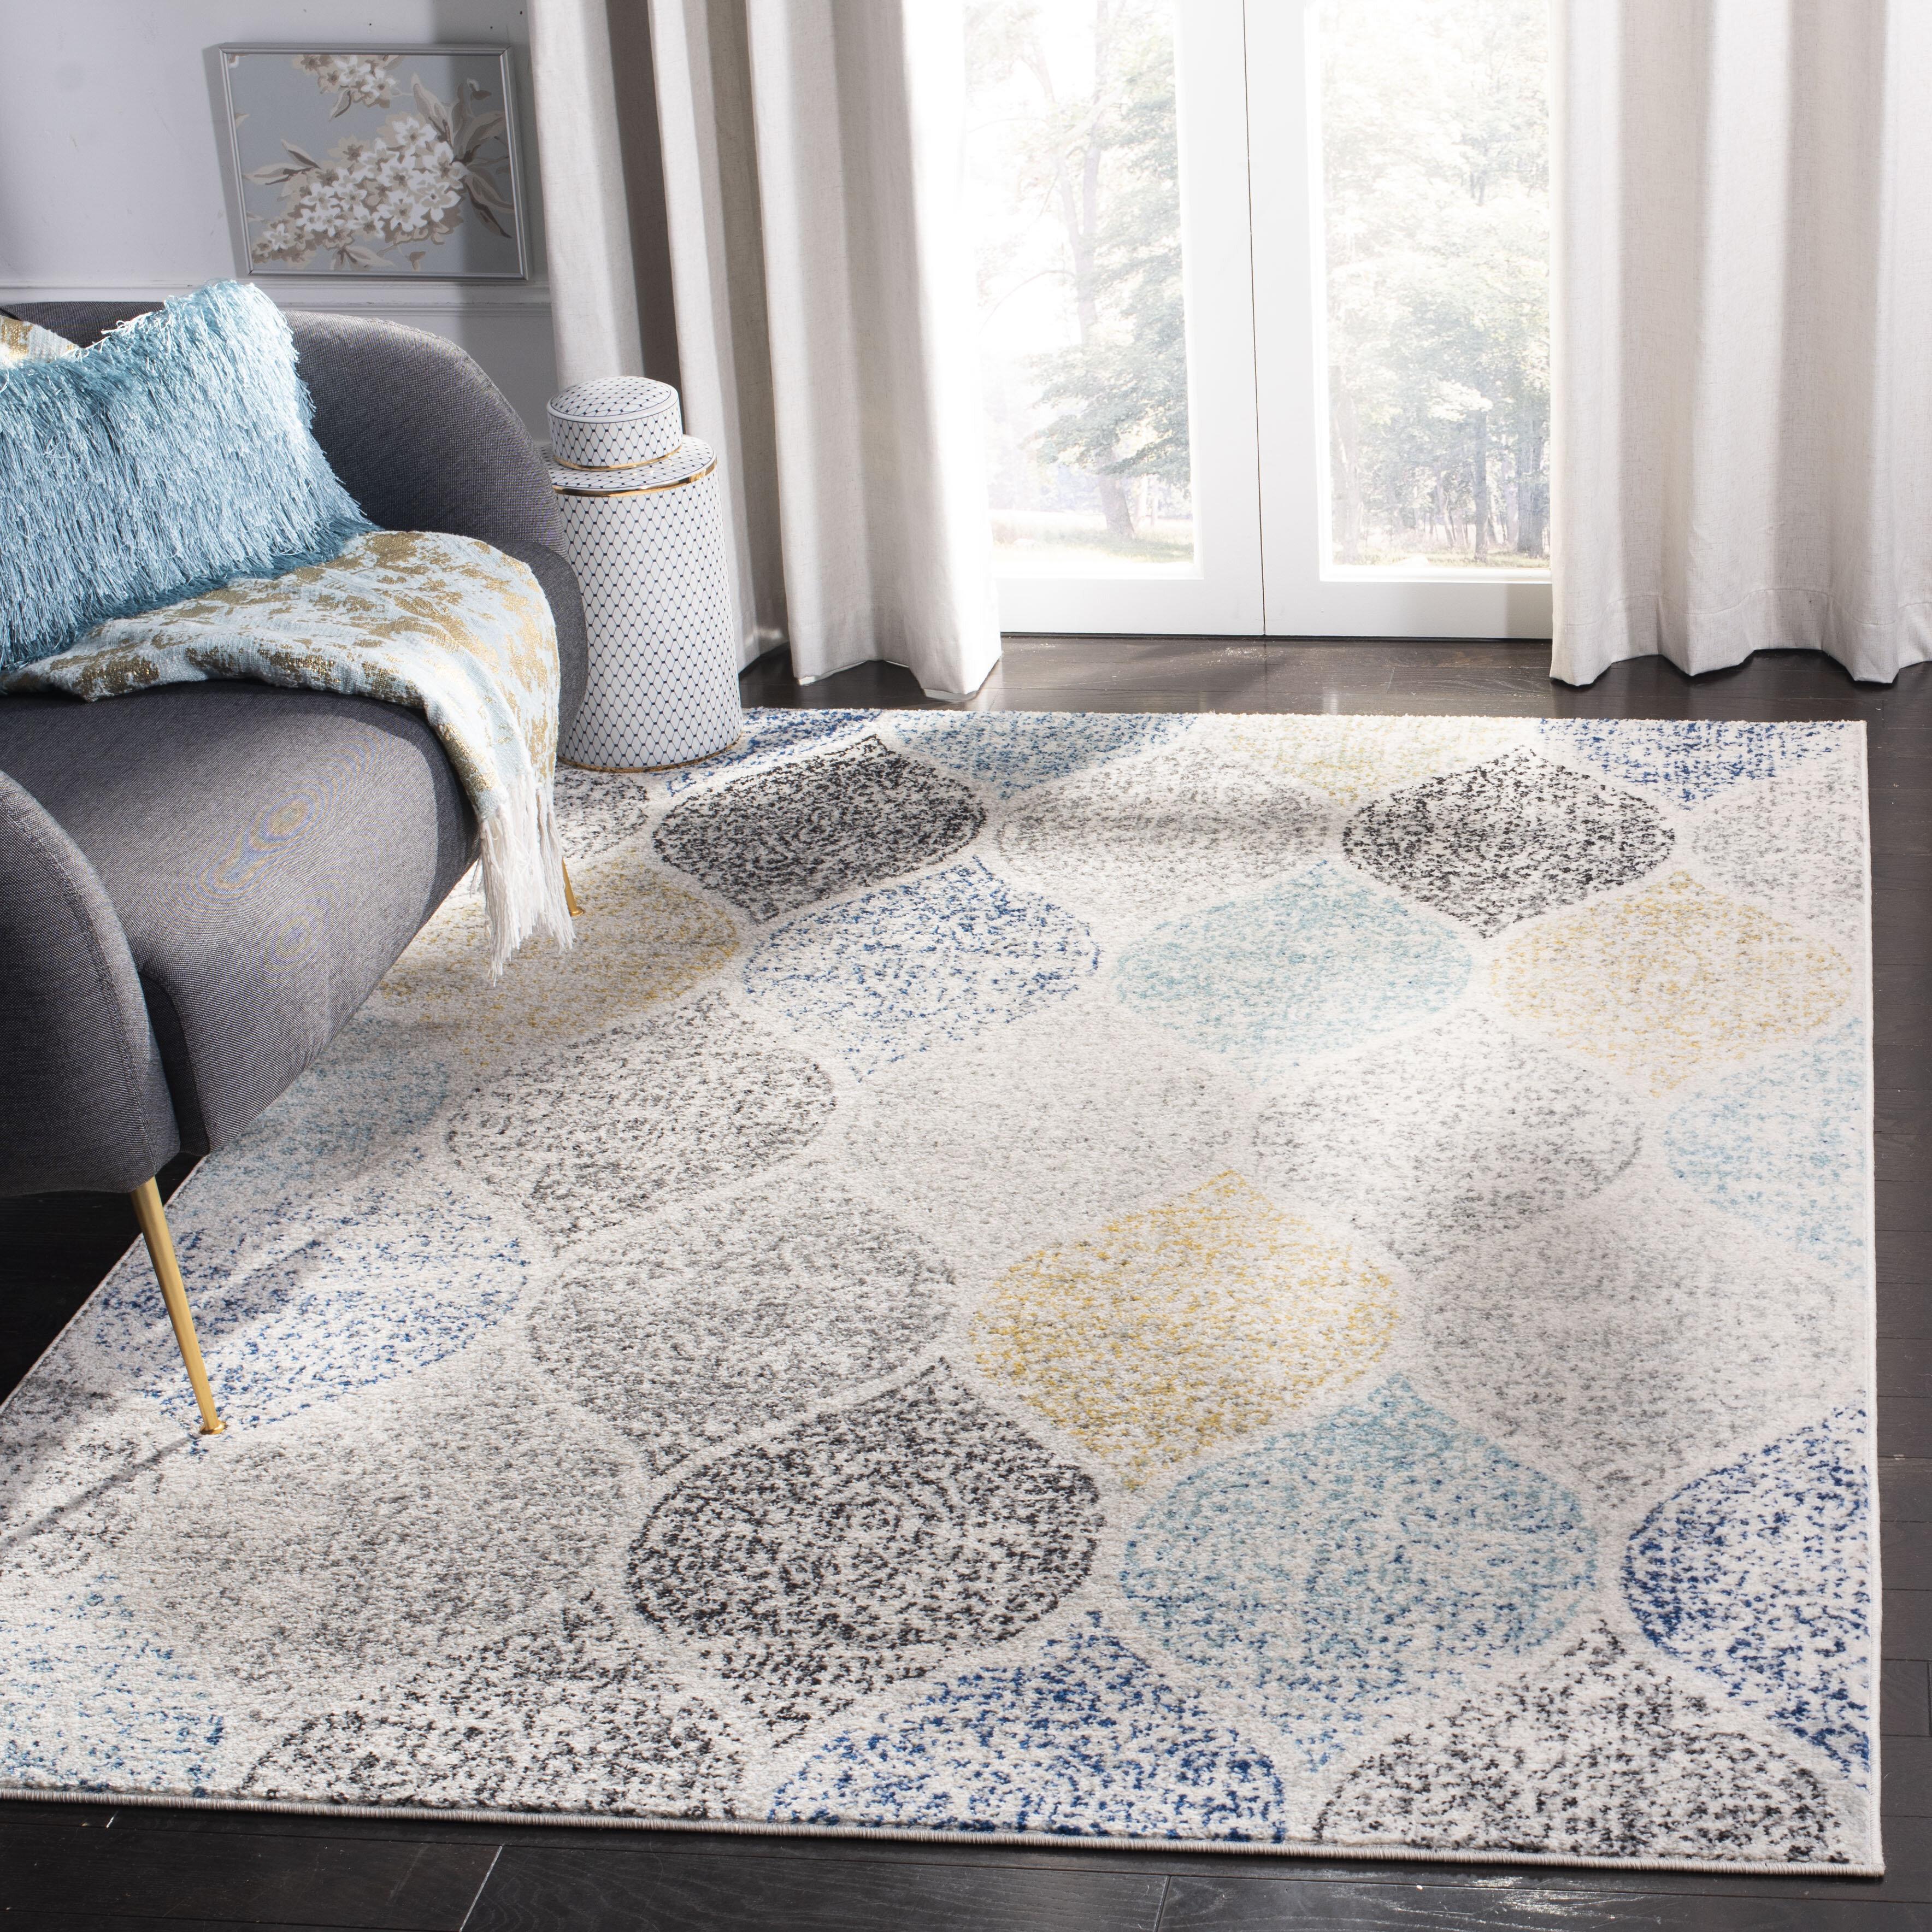 Geometric Ophelia Co Area Rugs You Ll Love In 2021 Wayfair